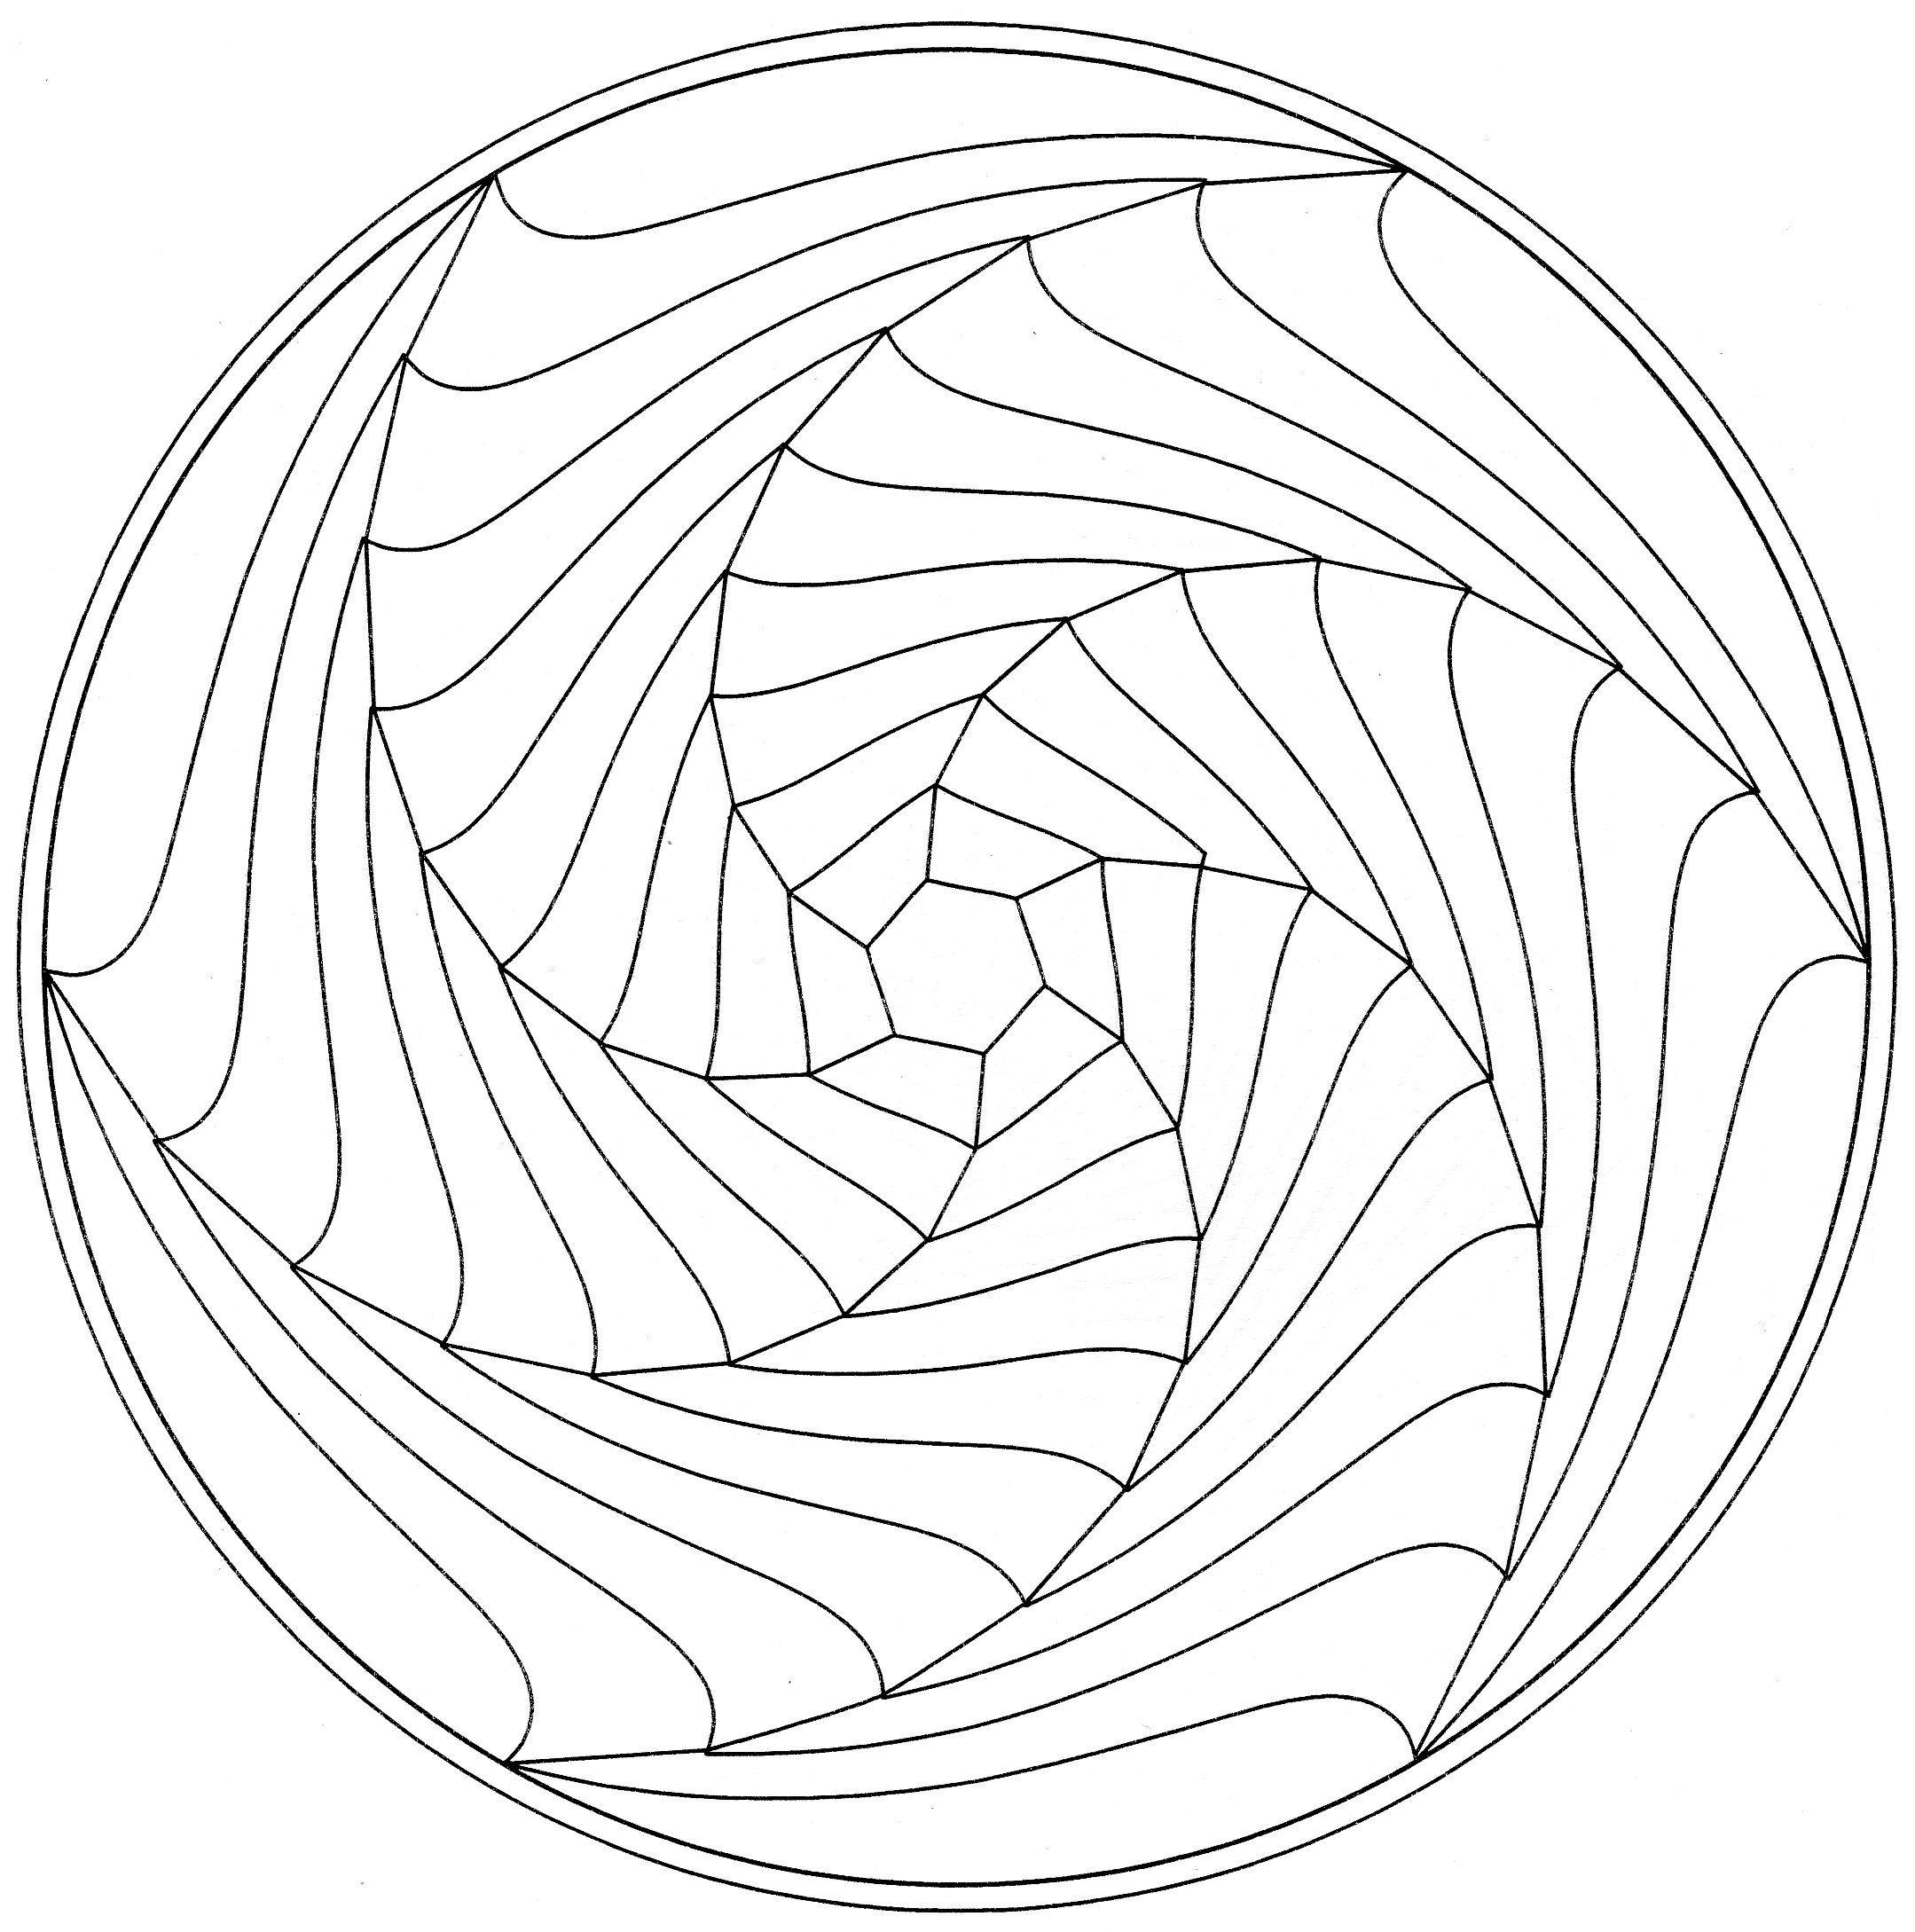 2159x2178 Spiral Mandala Coloring Pages Patterns Mandala